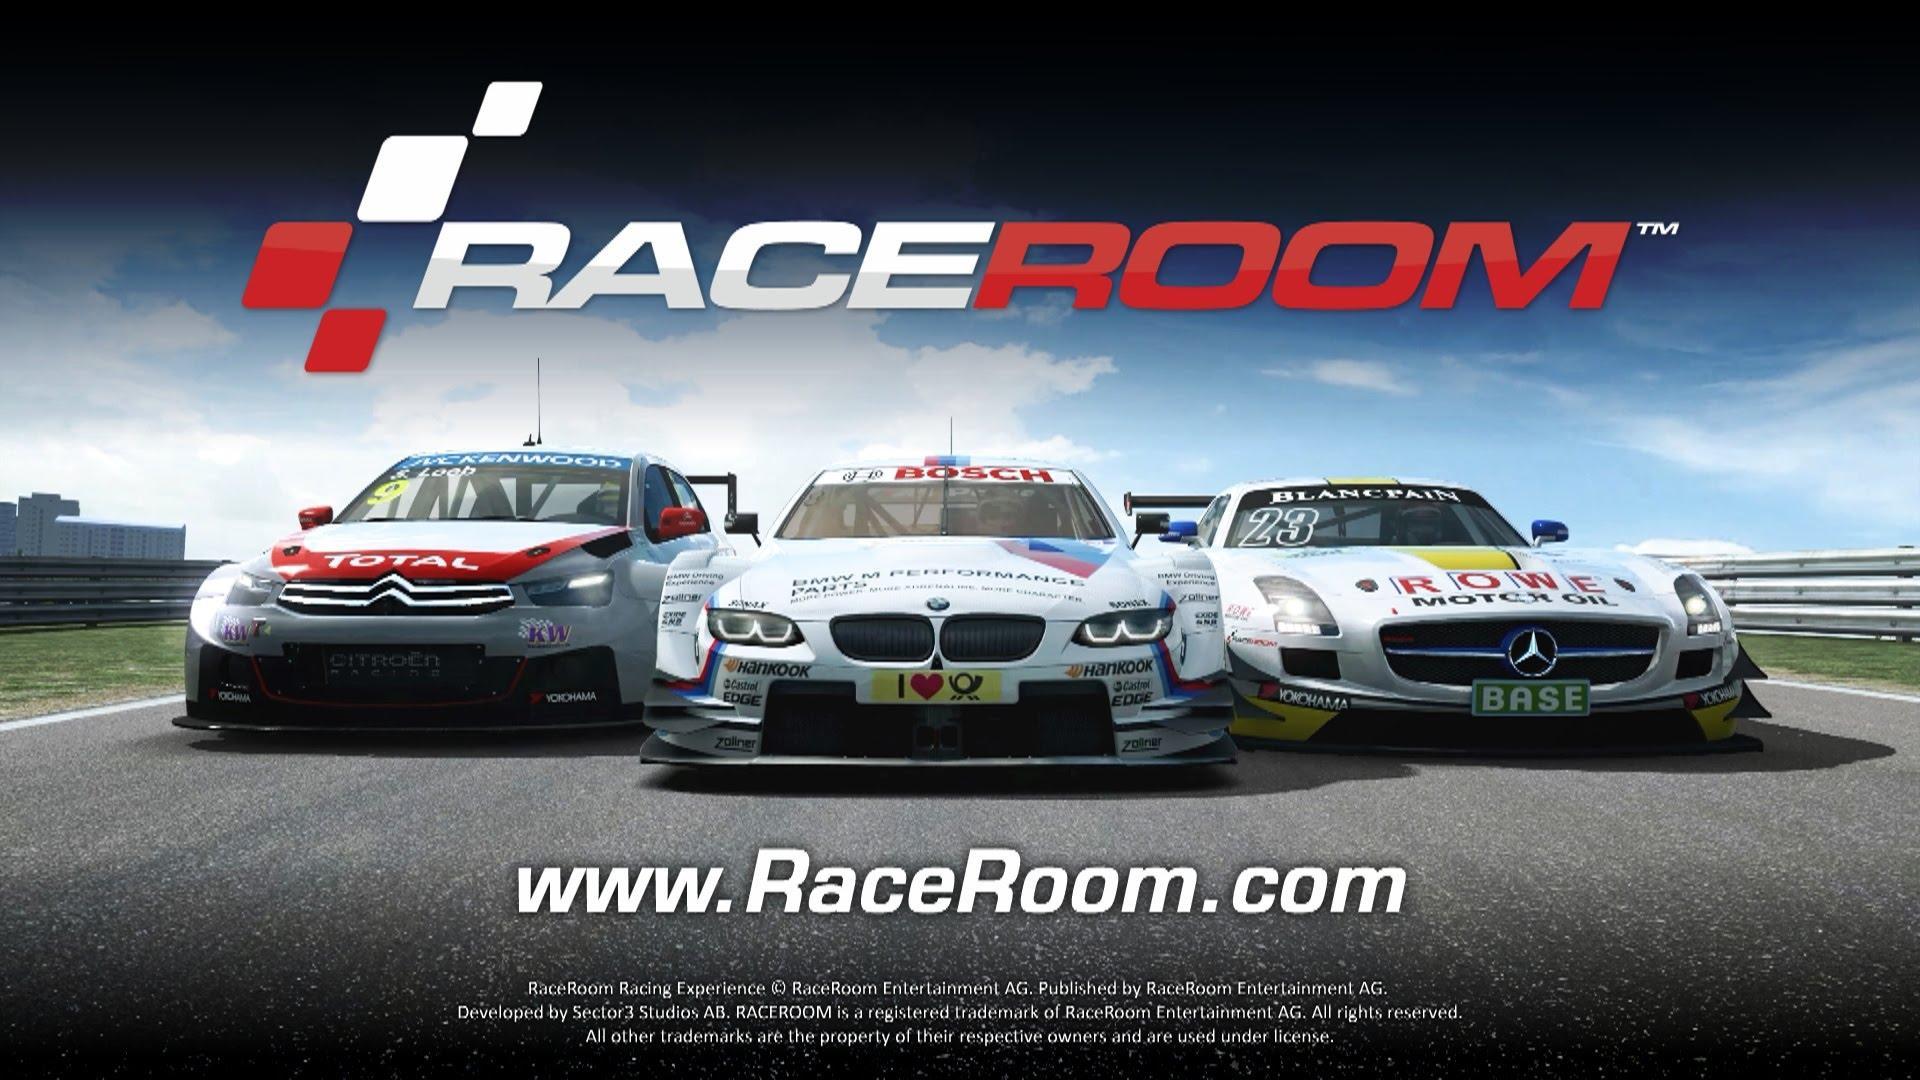 RaceRoomRacing Expérience (R3R Experience)